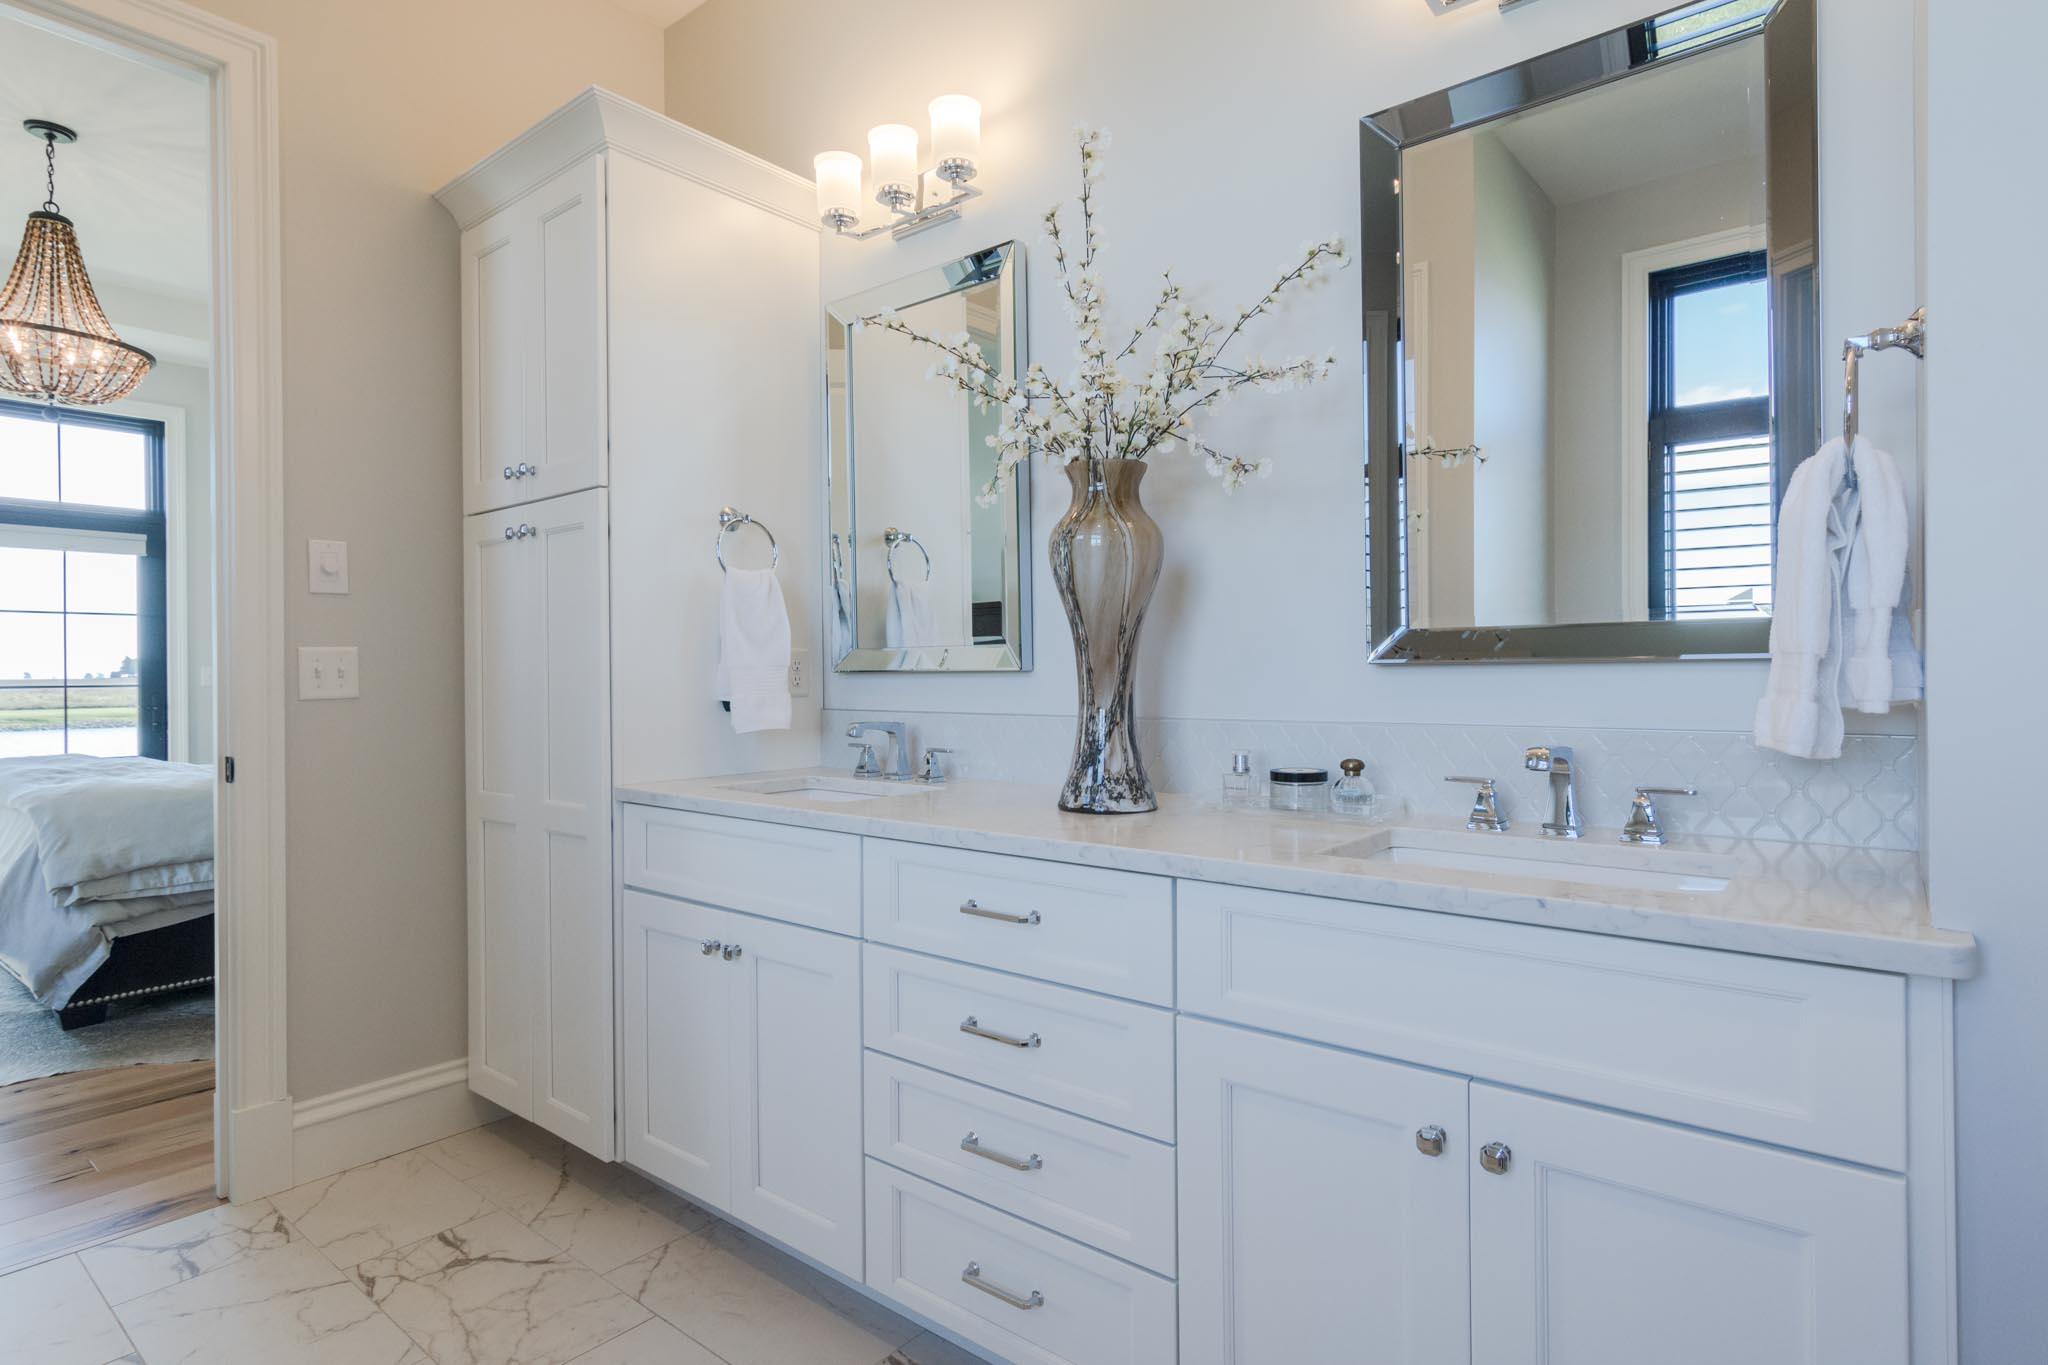 Custom Home Builders In Bloomington Champaign Keystone Homes - Bathroom remodel bloomington il